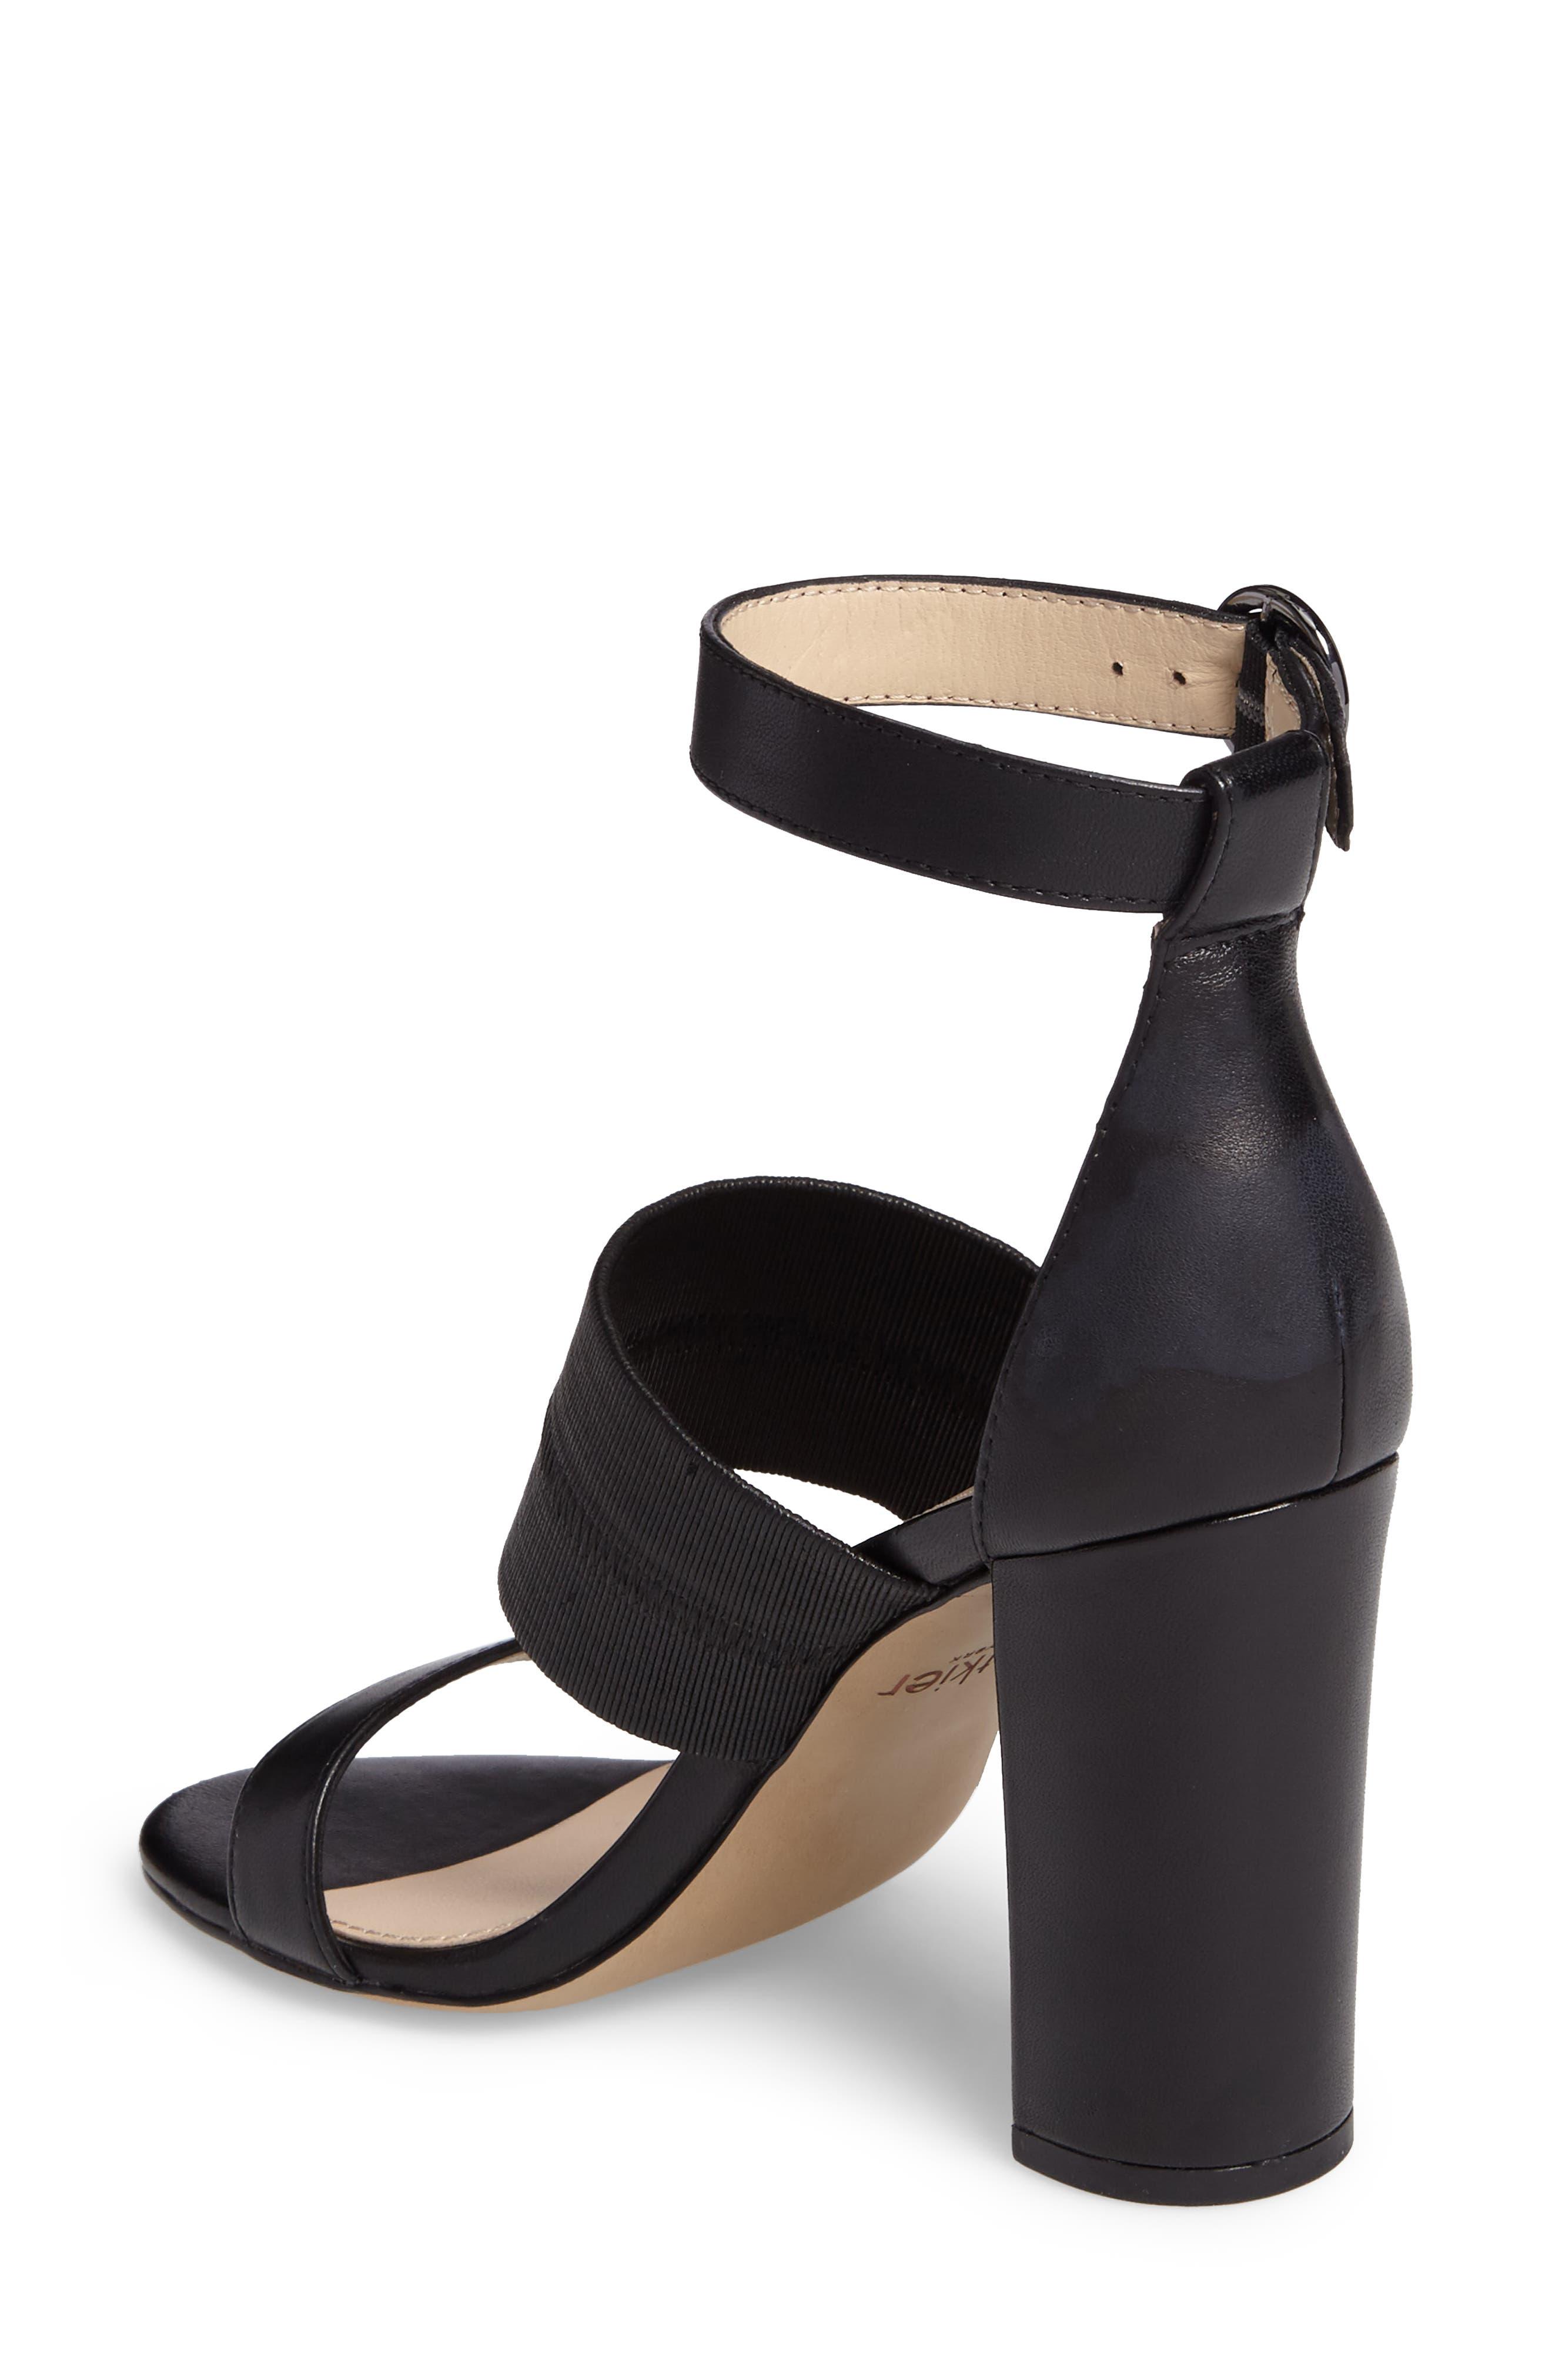 Gisella Ankle Strap Sandal,                             Alternate thumbnail 2, color,                             Black Leather